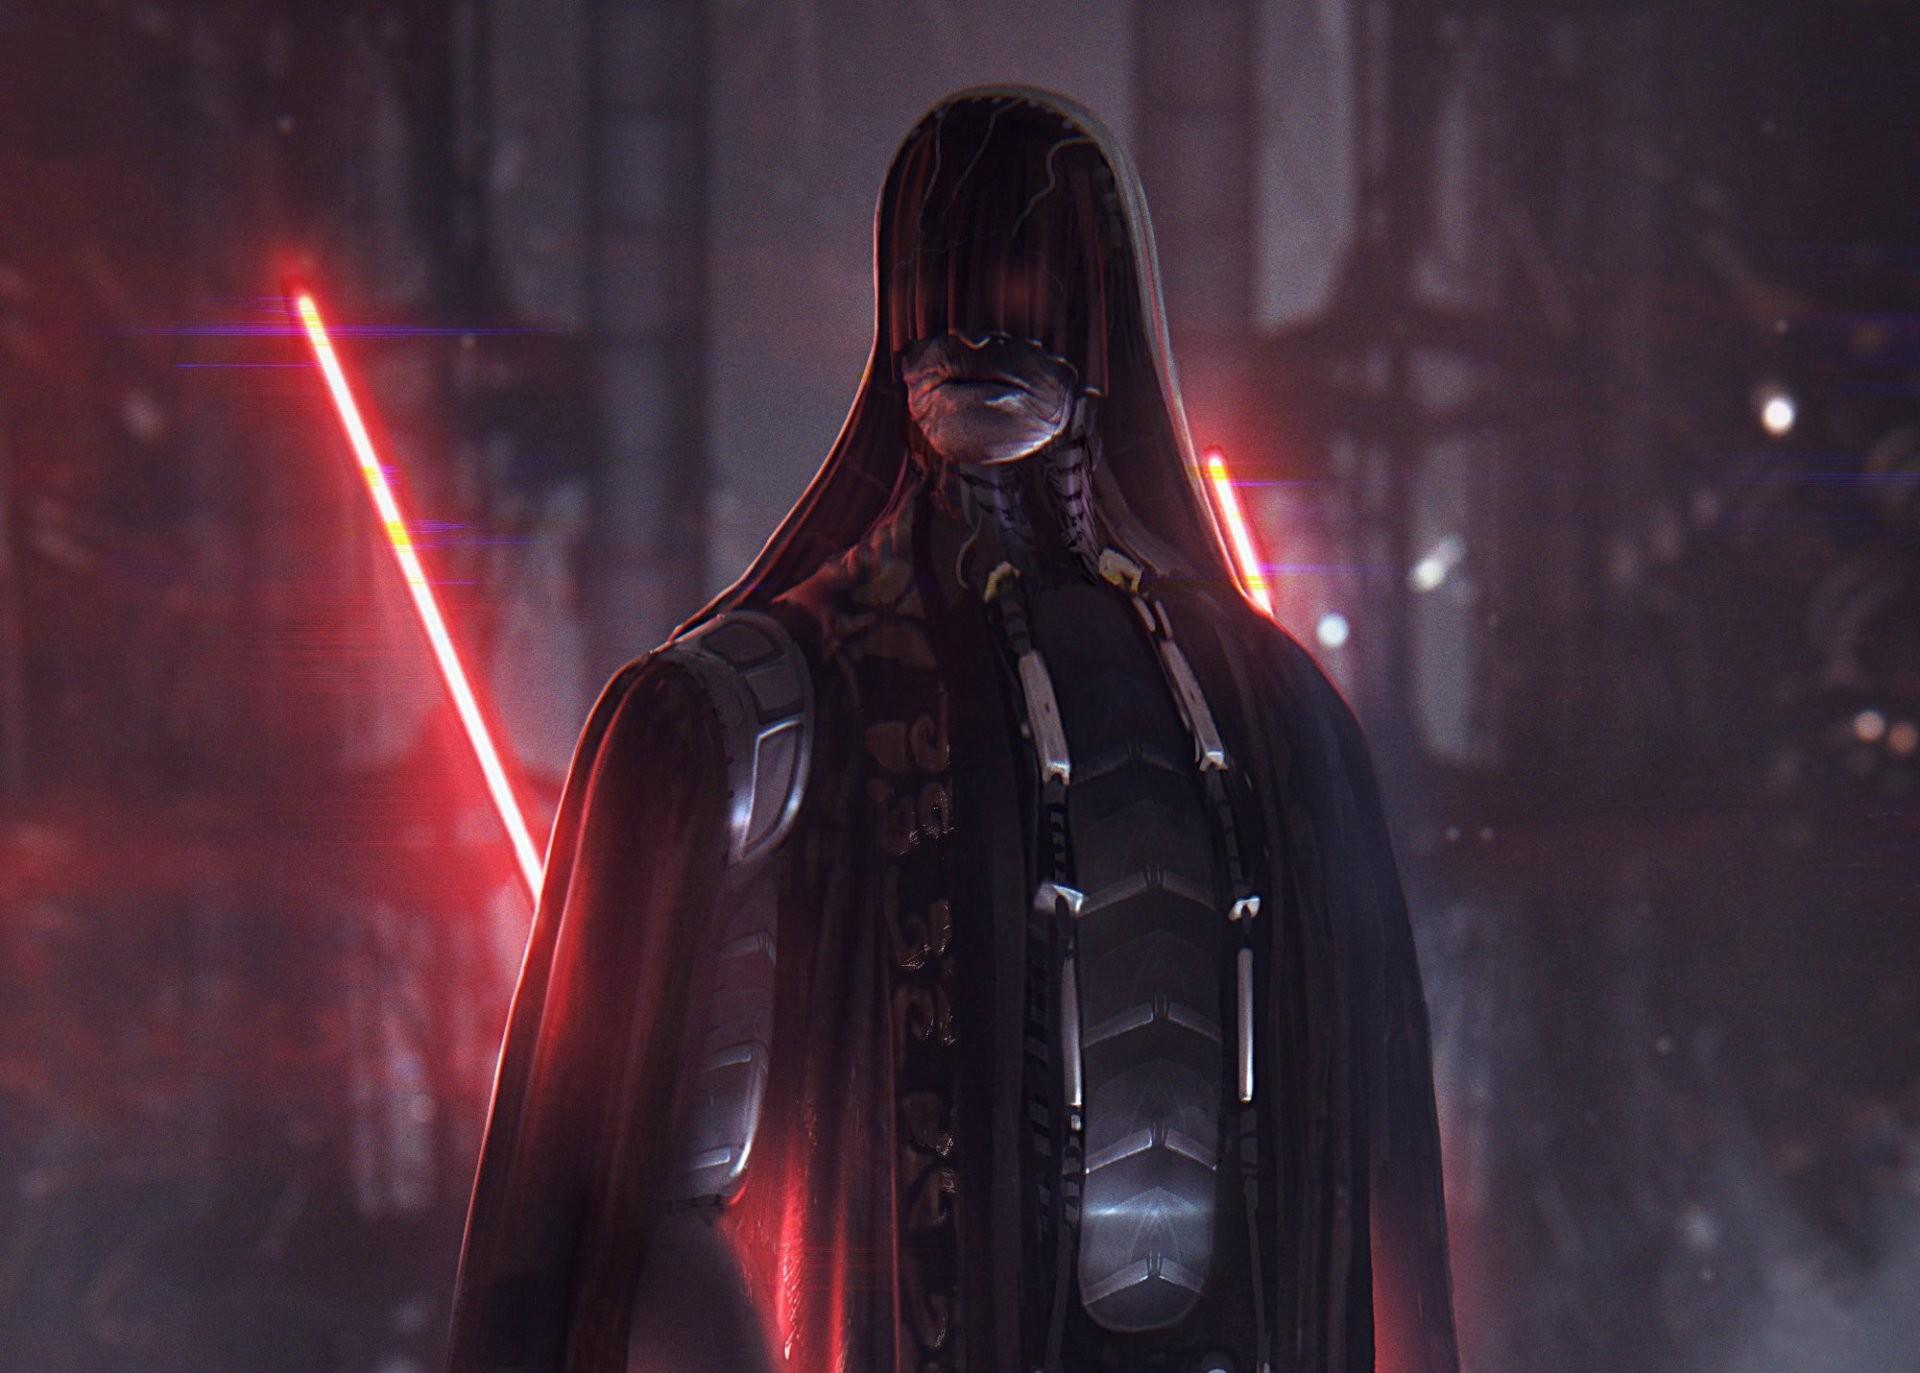 sith lord lightsaber star wars fan art sith laser sword